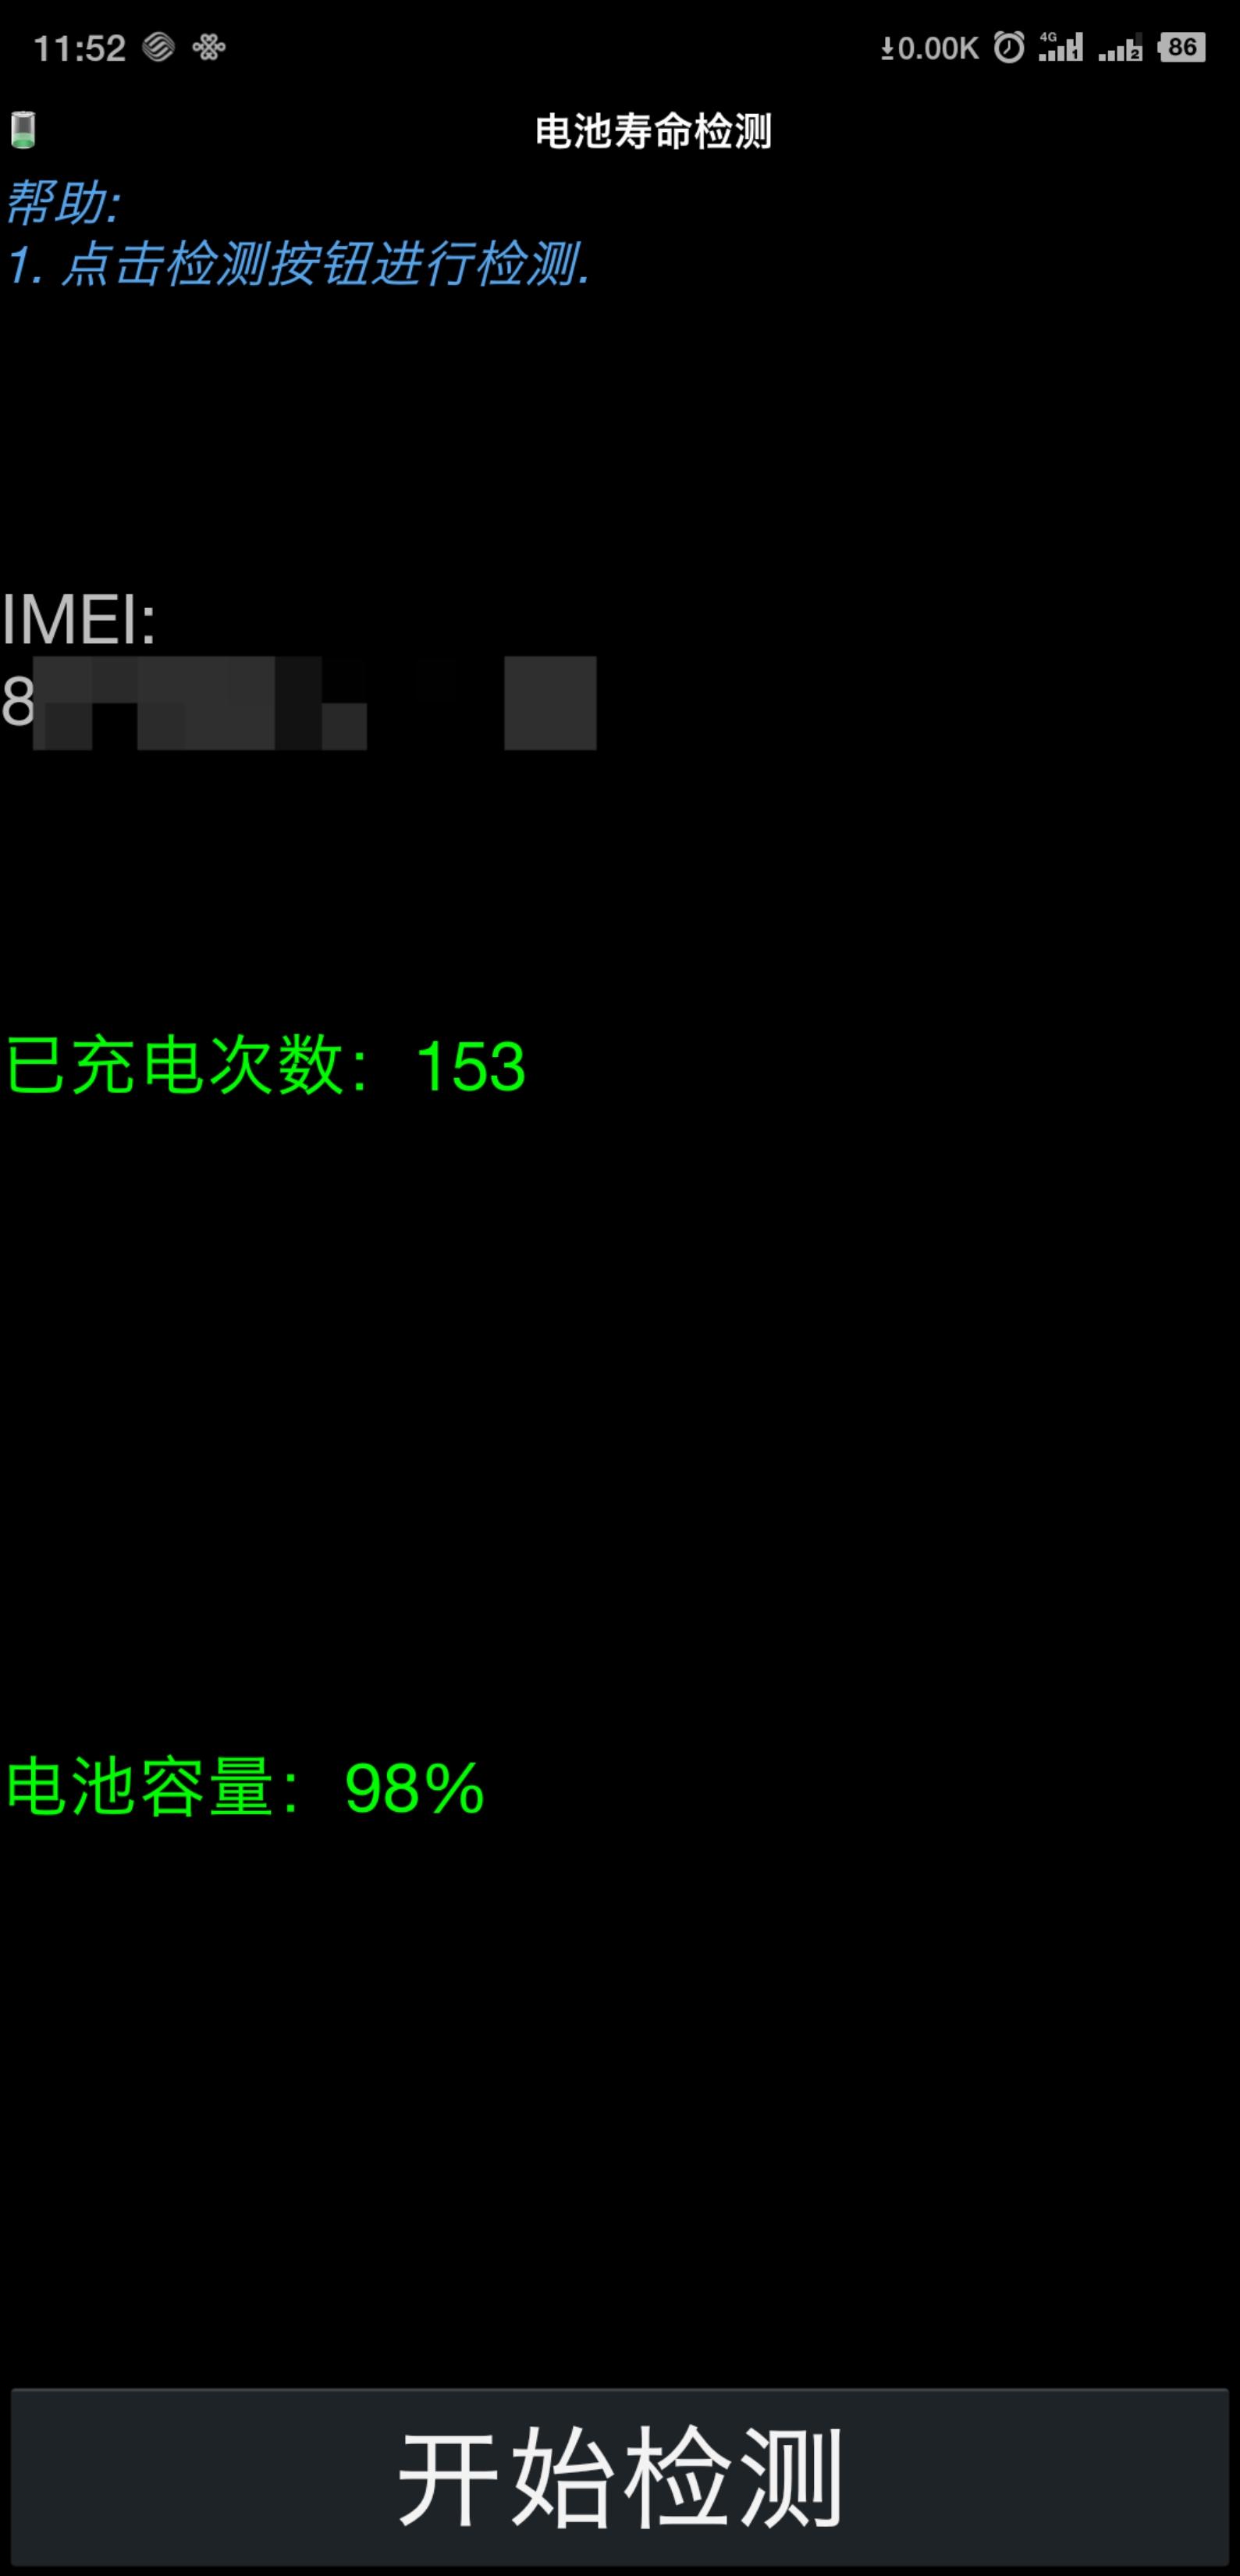 ??_Screenshot_2018-10-26-11-52-03-432_??????.png